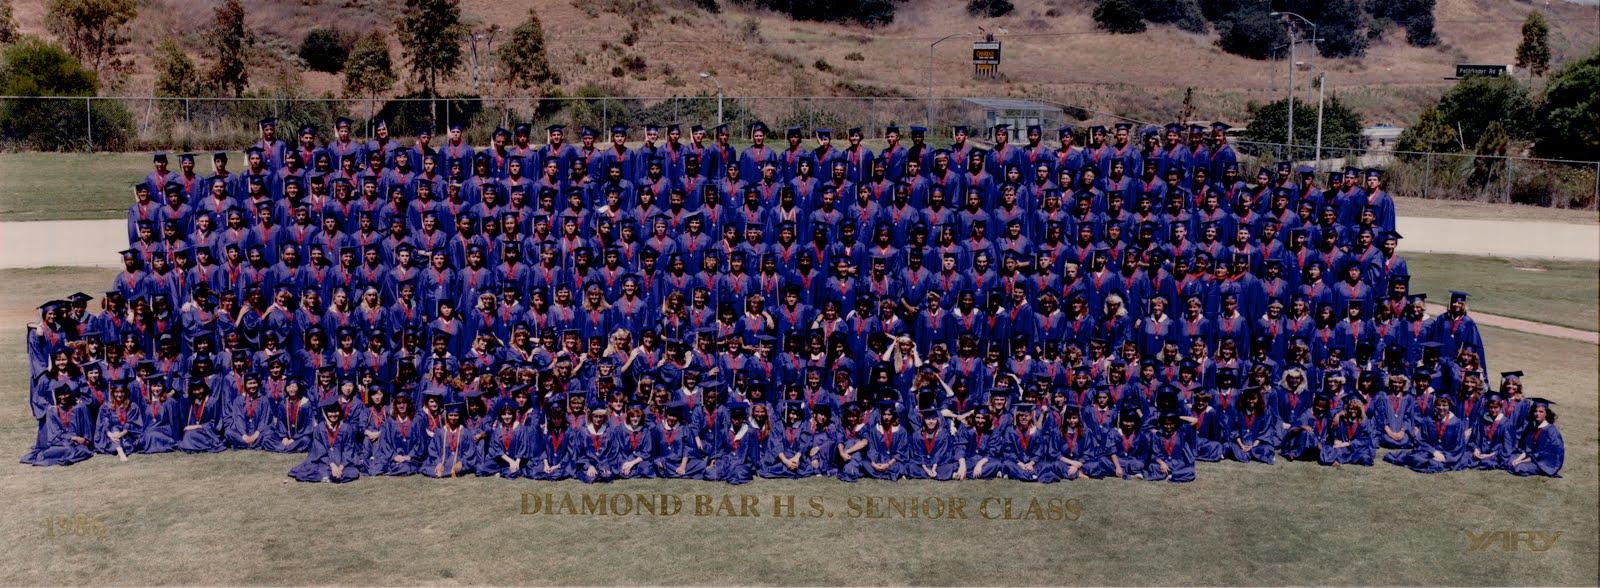 Diamond Bar High School Class Of 1986: 1986 Diamond Bar High Inside Diamond Bar High School Holiday Schedule